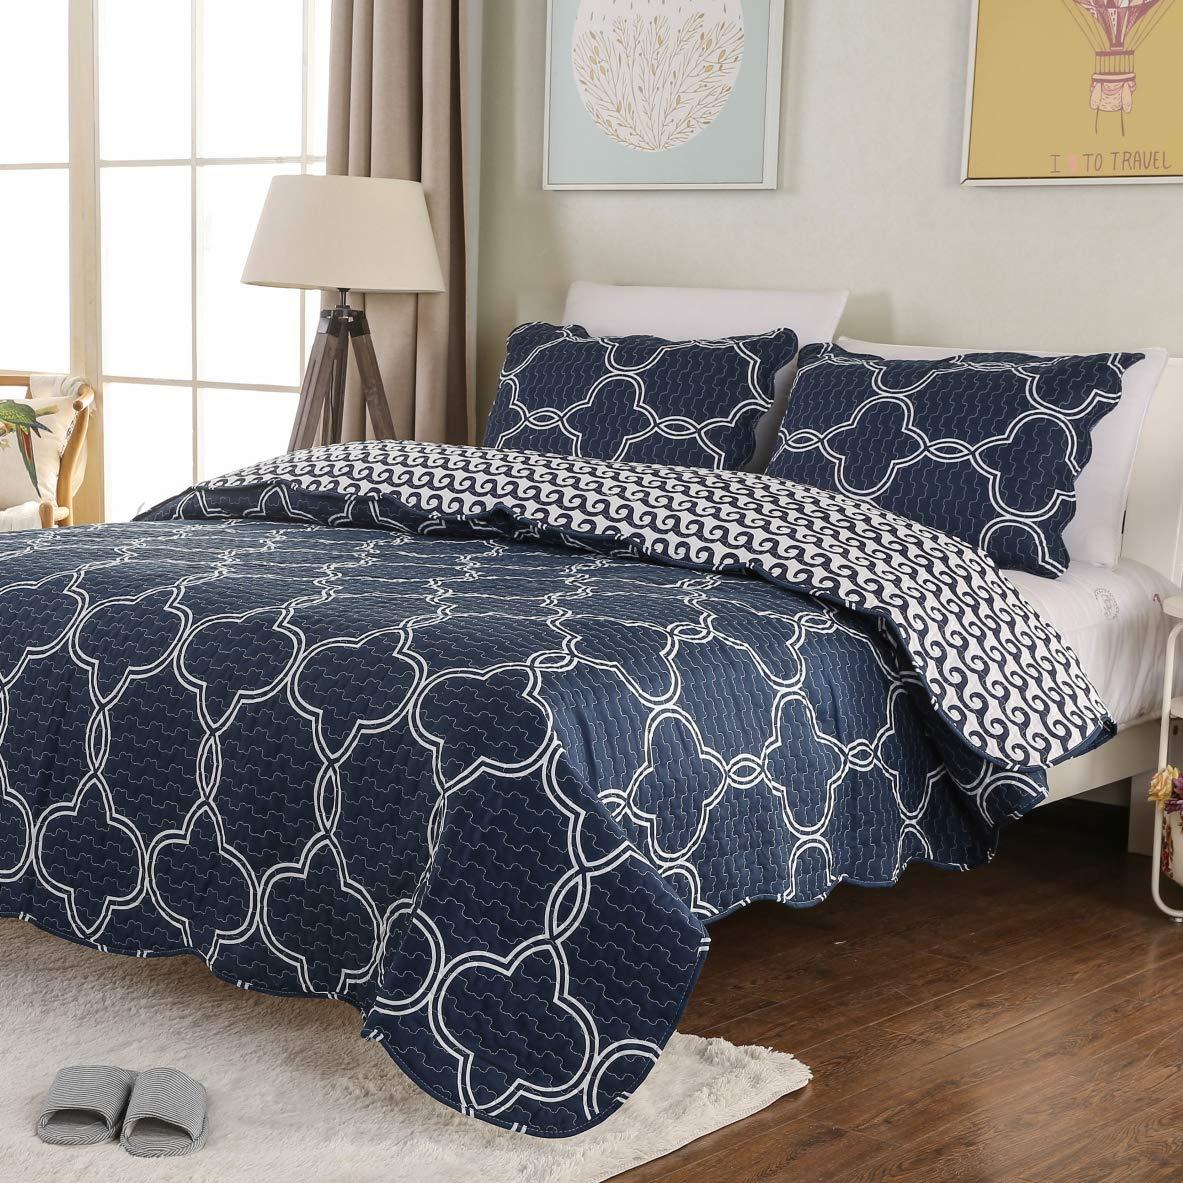 Mohap Floral Quilt Set 3 Piece Queen Size Lightweight Bedspread 1 Quilt and 2 Matching Shams for All Season Dark Blue Geometric Pattern